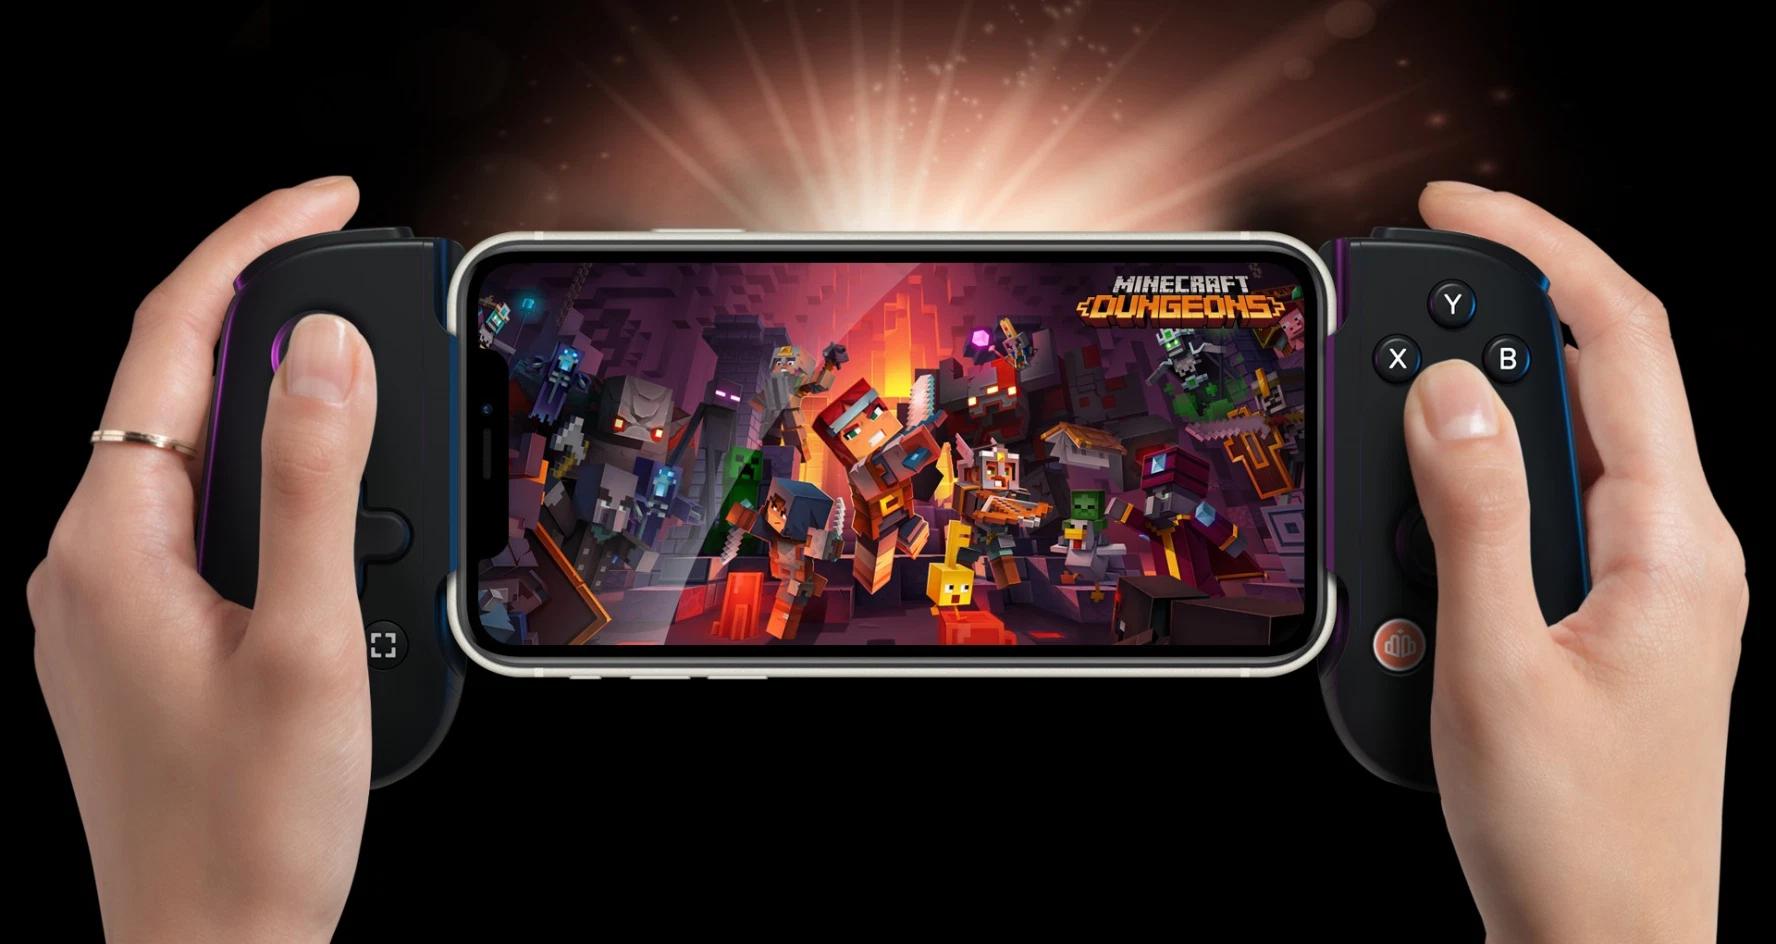 Xbox Cloud Gaming officiellt släppt till PC och Iphone